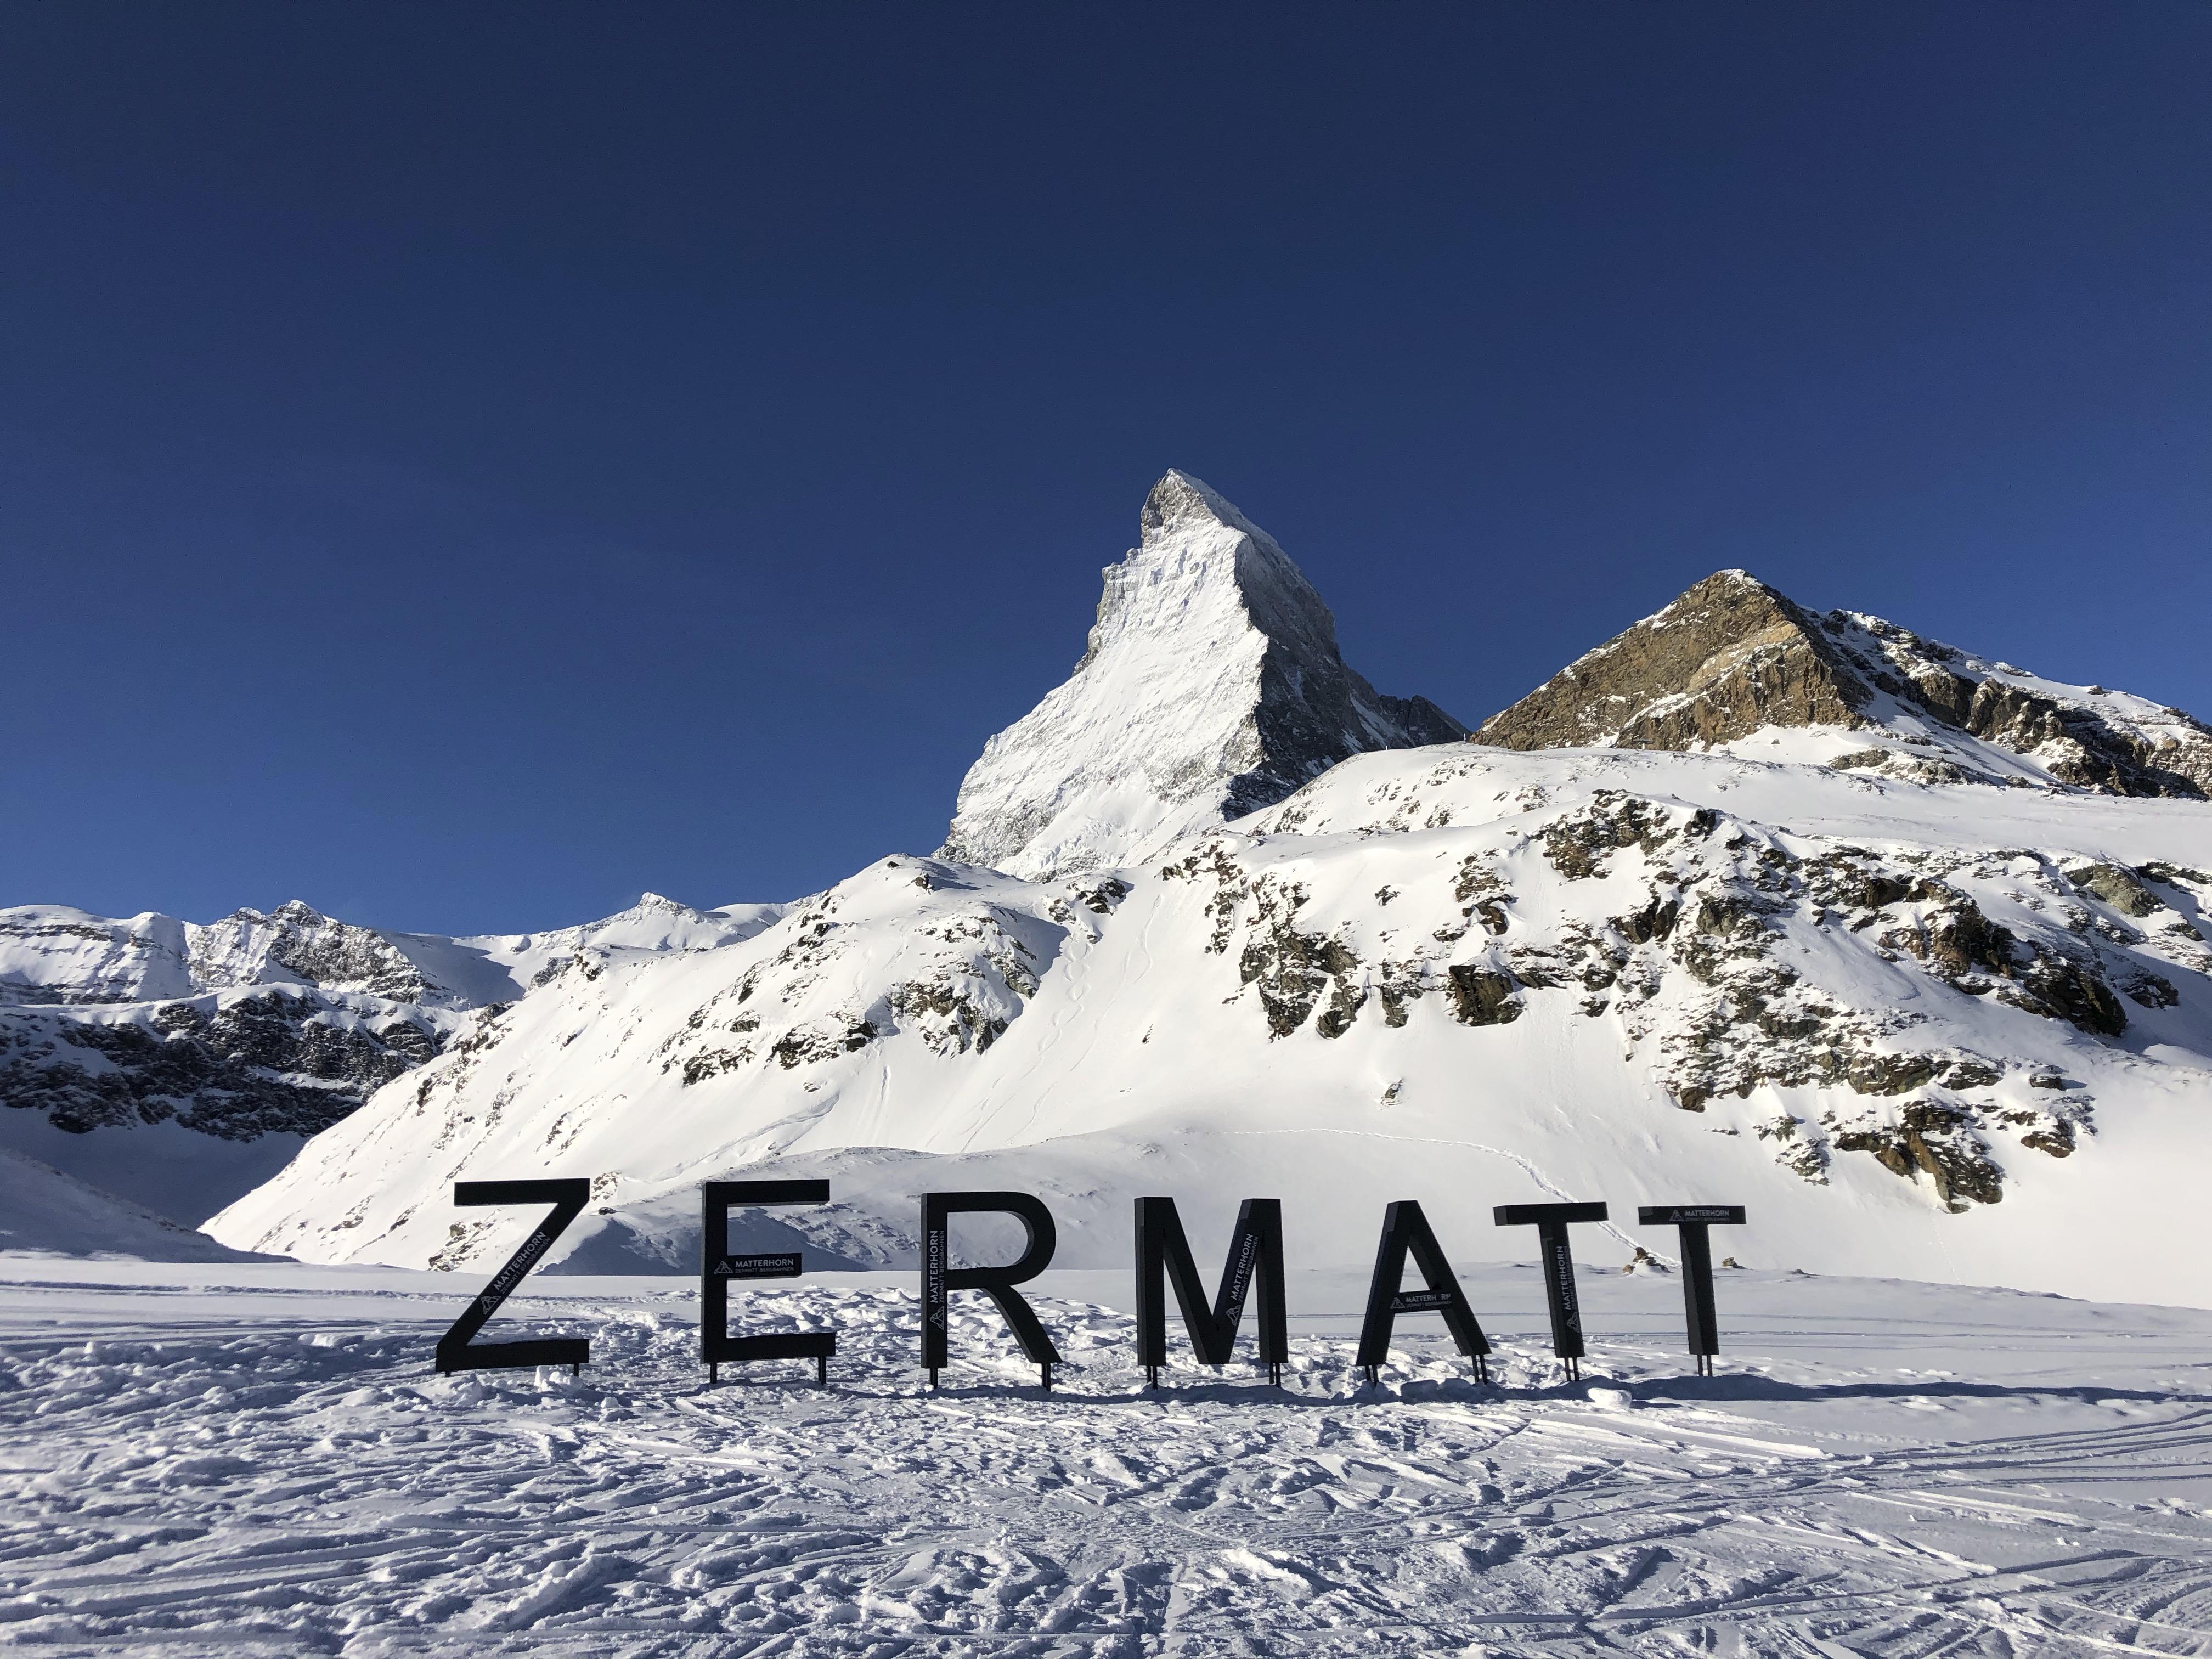 Zermatt sign with the matterhorn in the background.